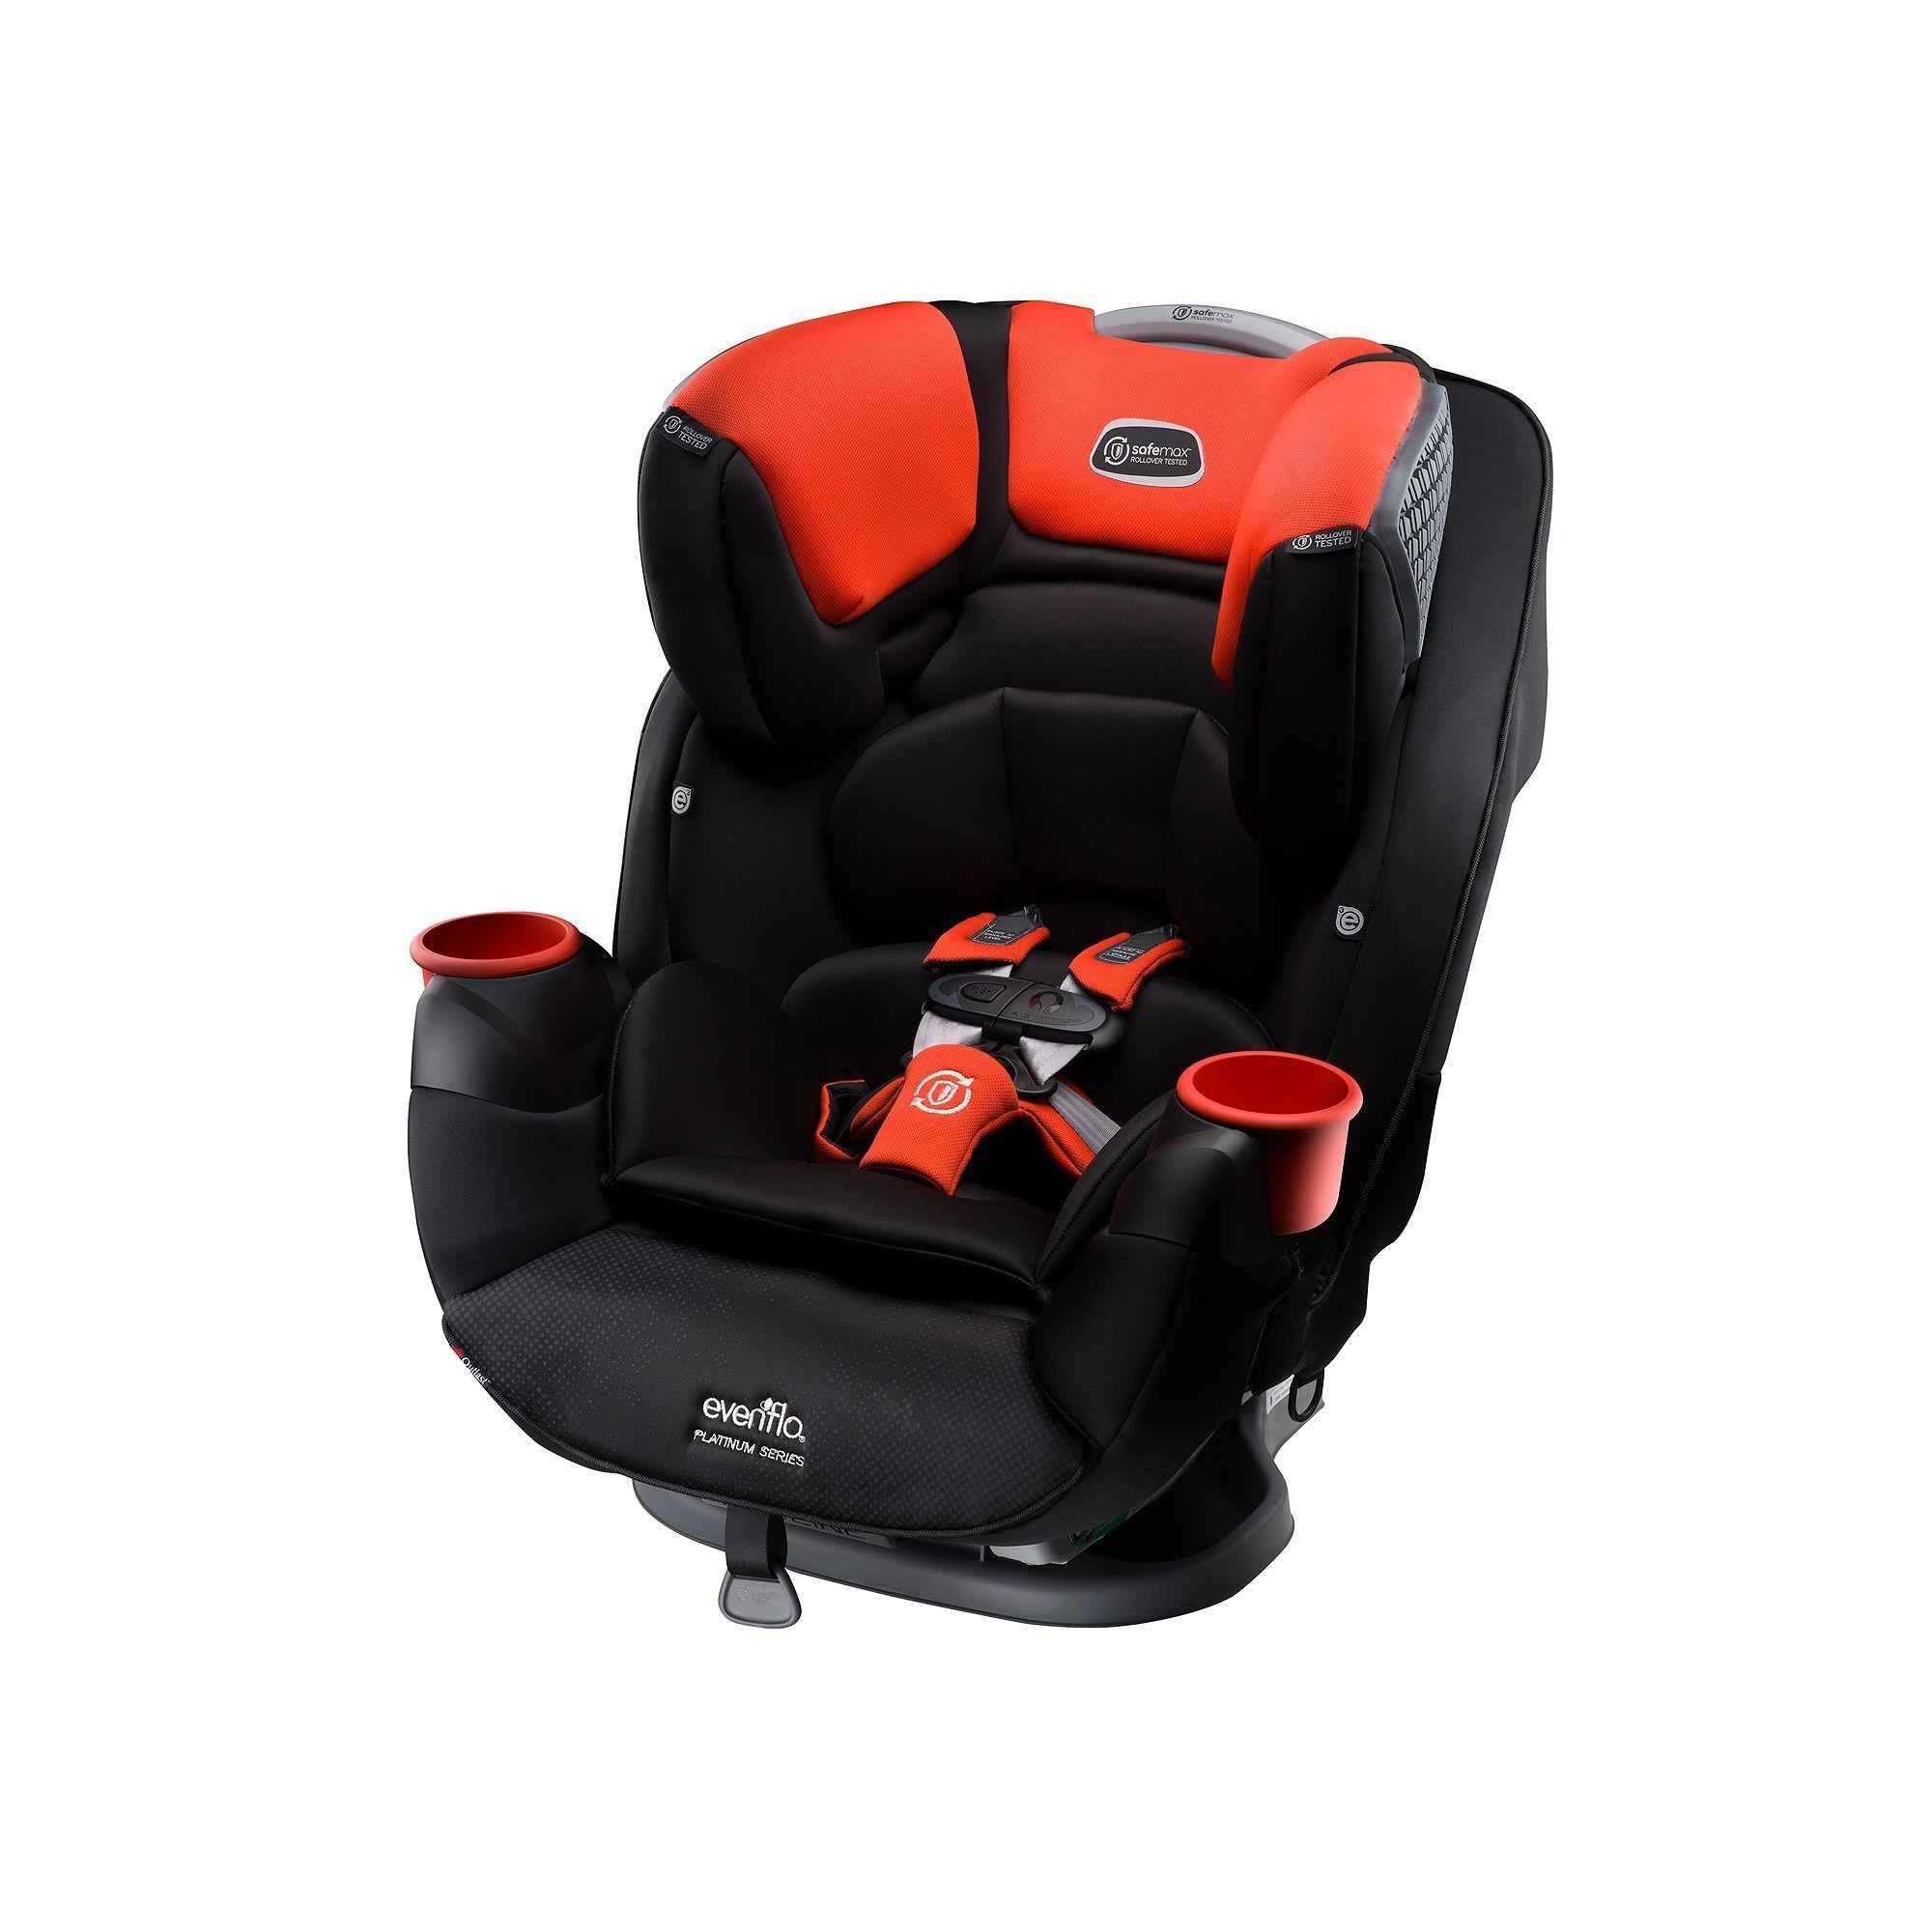 Evenflo Platinum SafeMax All In One Convertible Baby Infant Car Seat Orange